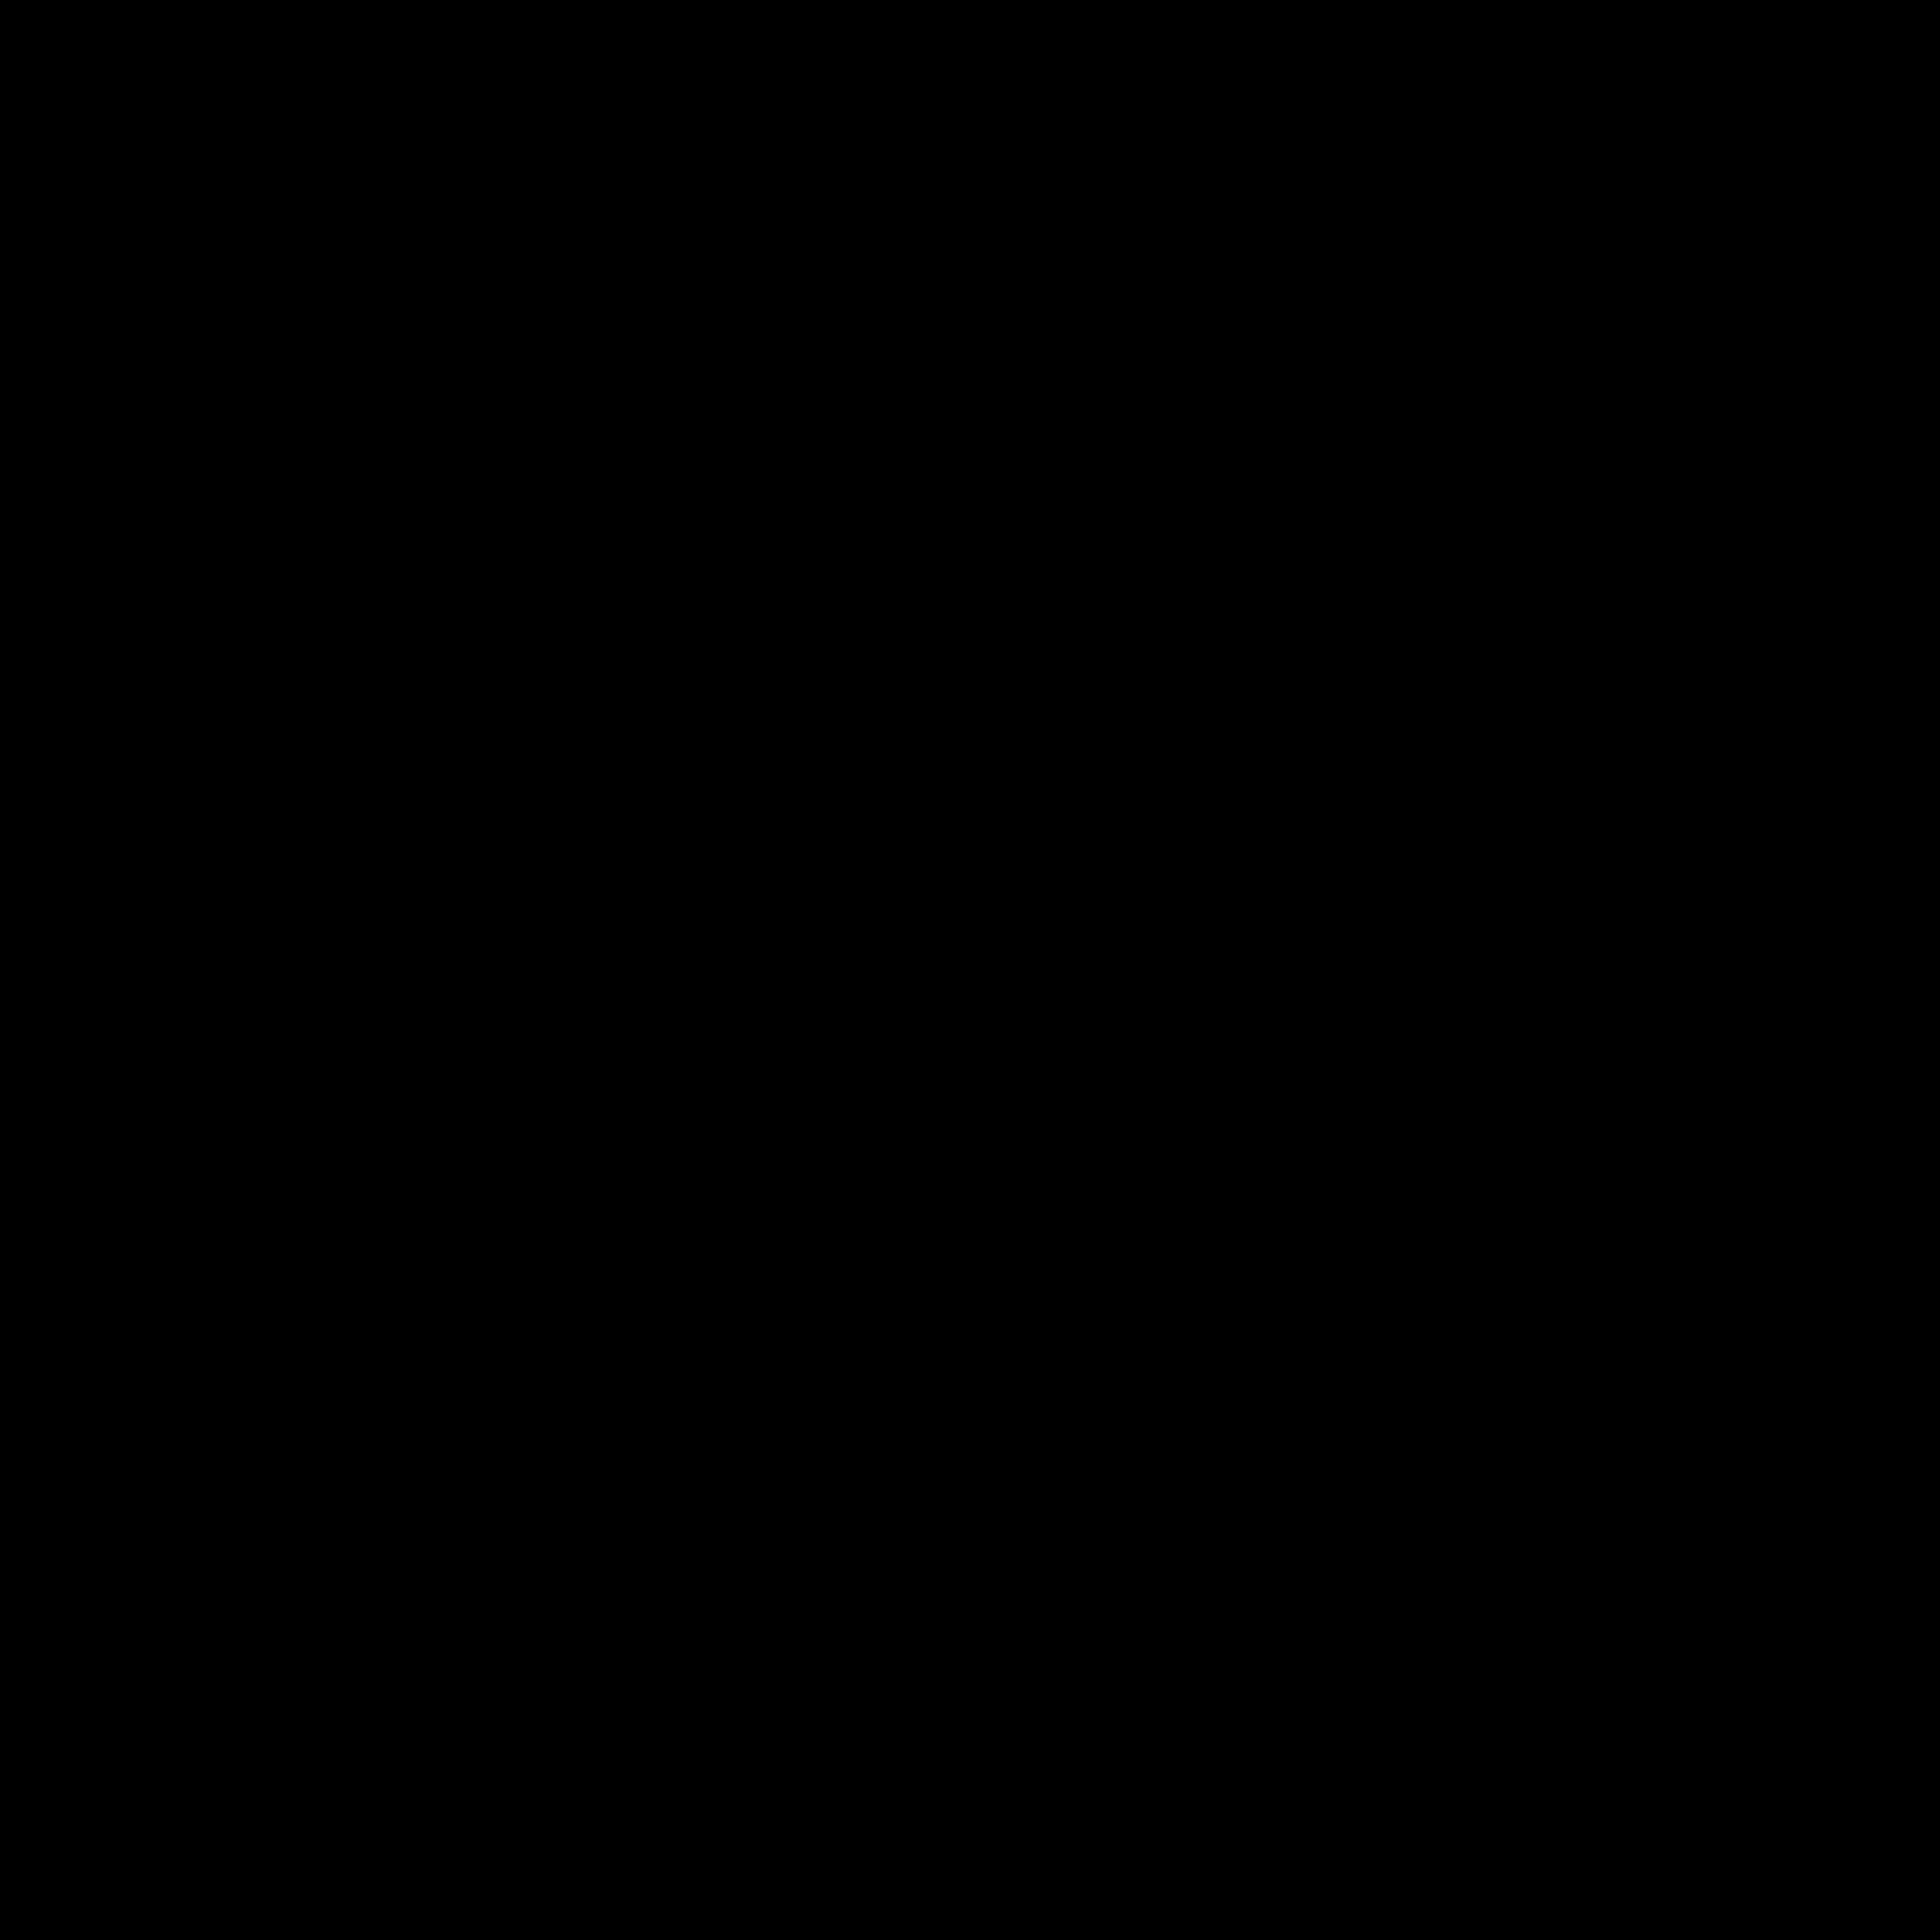 Xerox Logo Png Transparent & Svg Vector - Pluspng Pluspng.com - Xerox Logo PNG